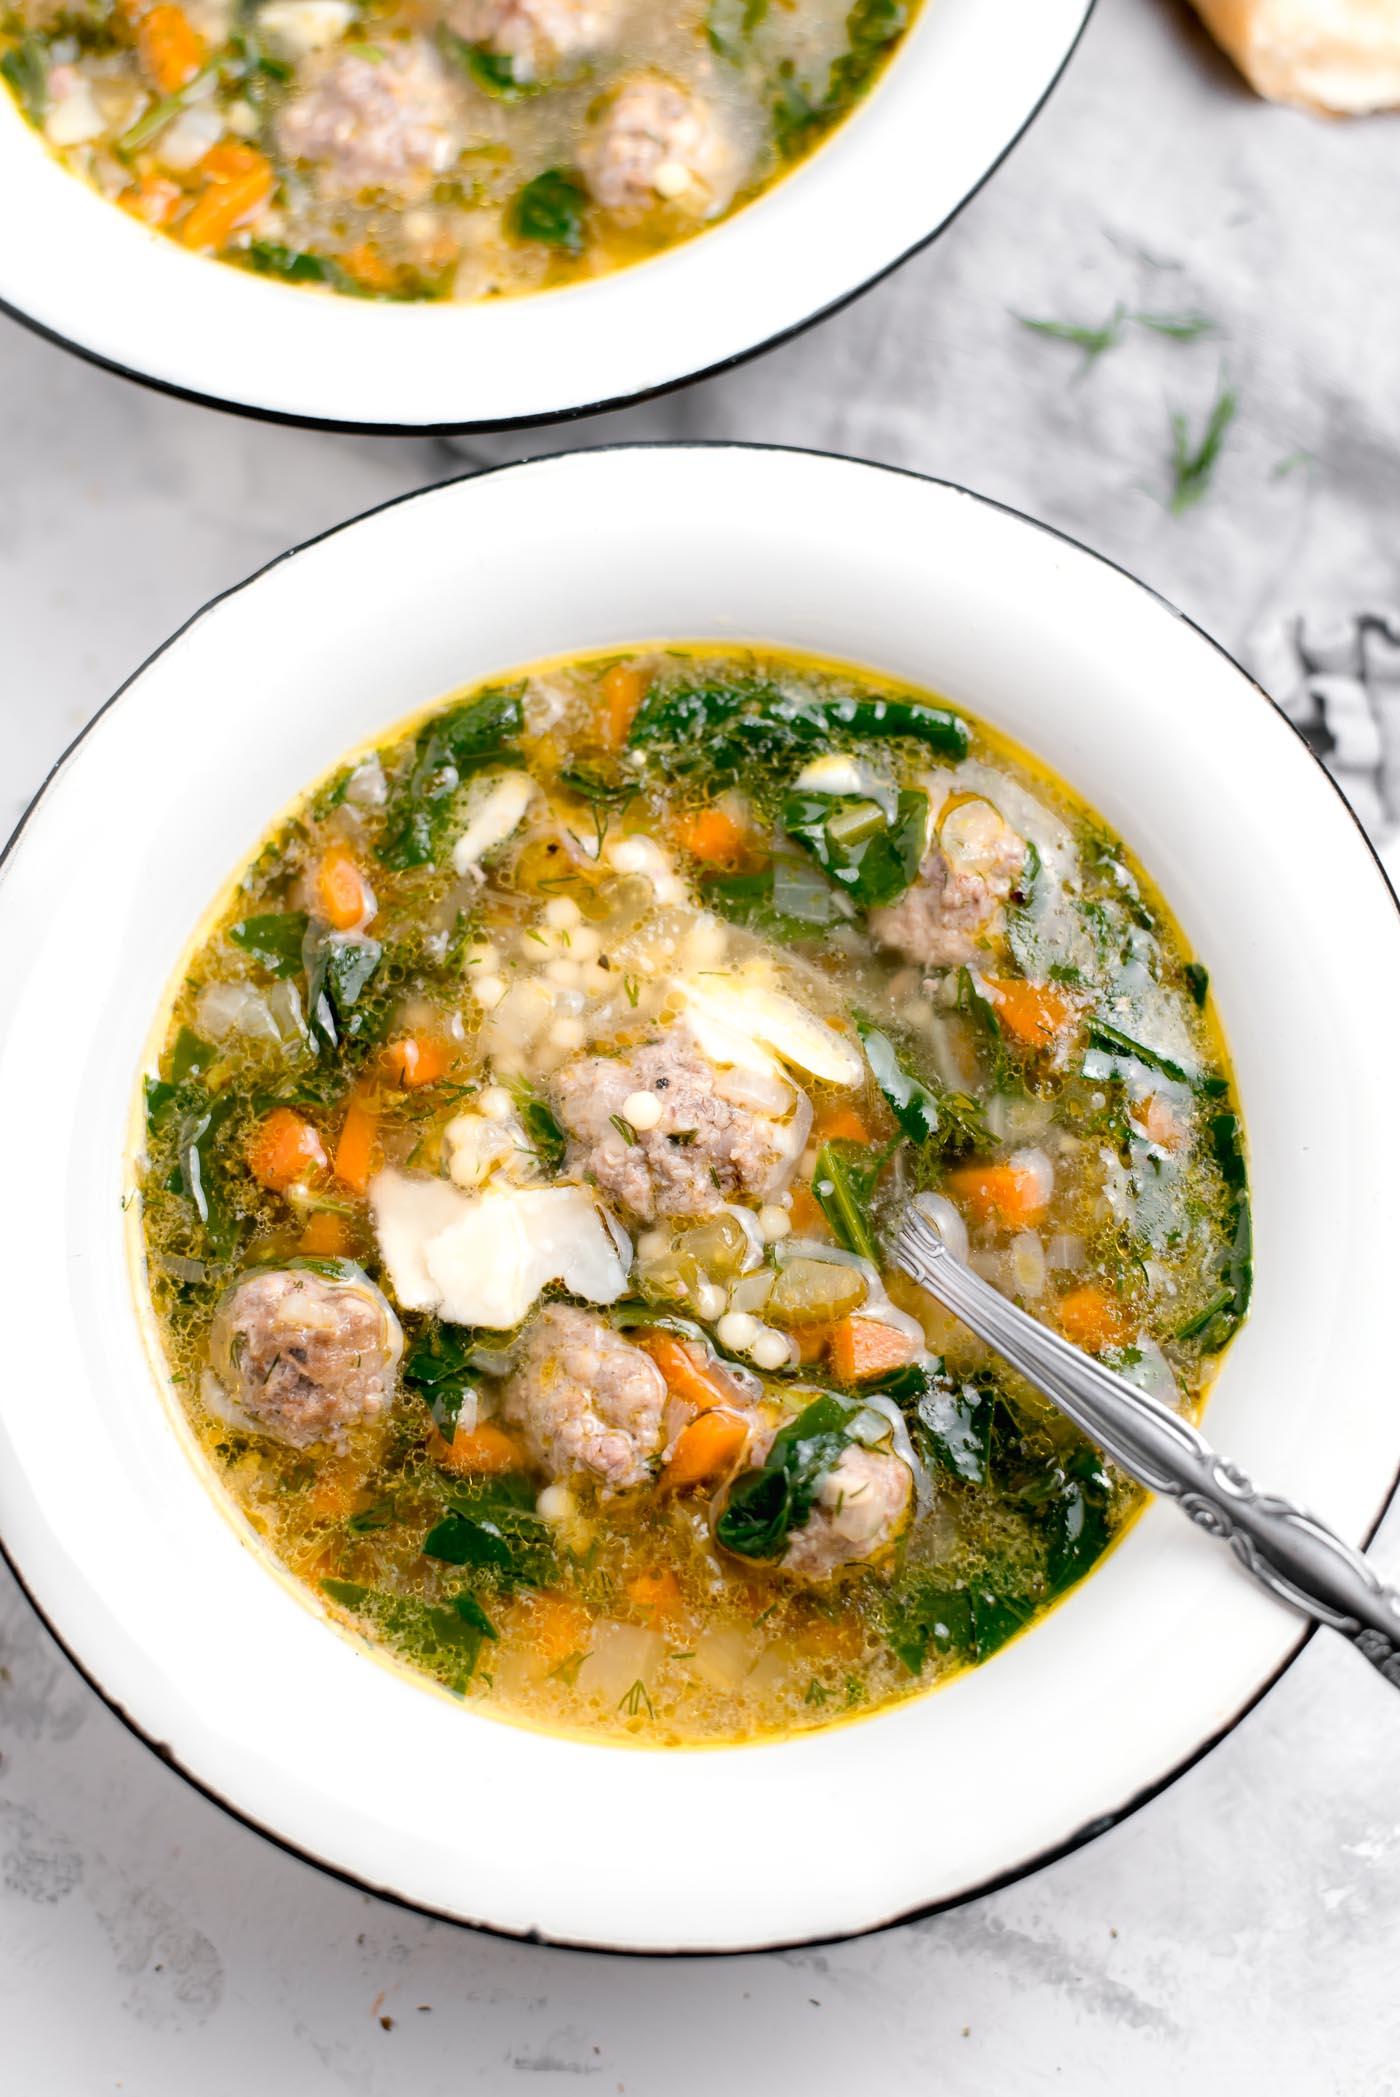 Italian Wedding Soup Can.Hearty Italian Wedding Soup